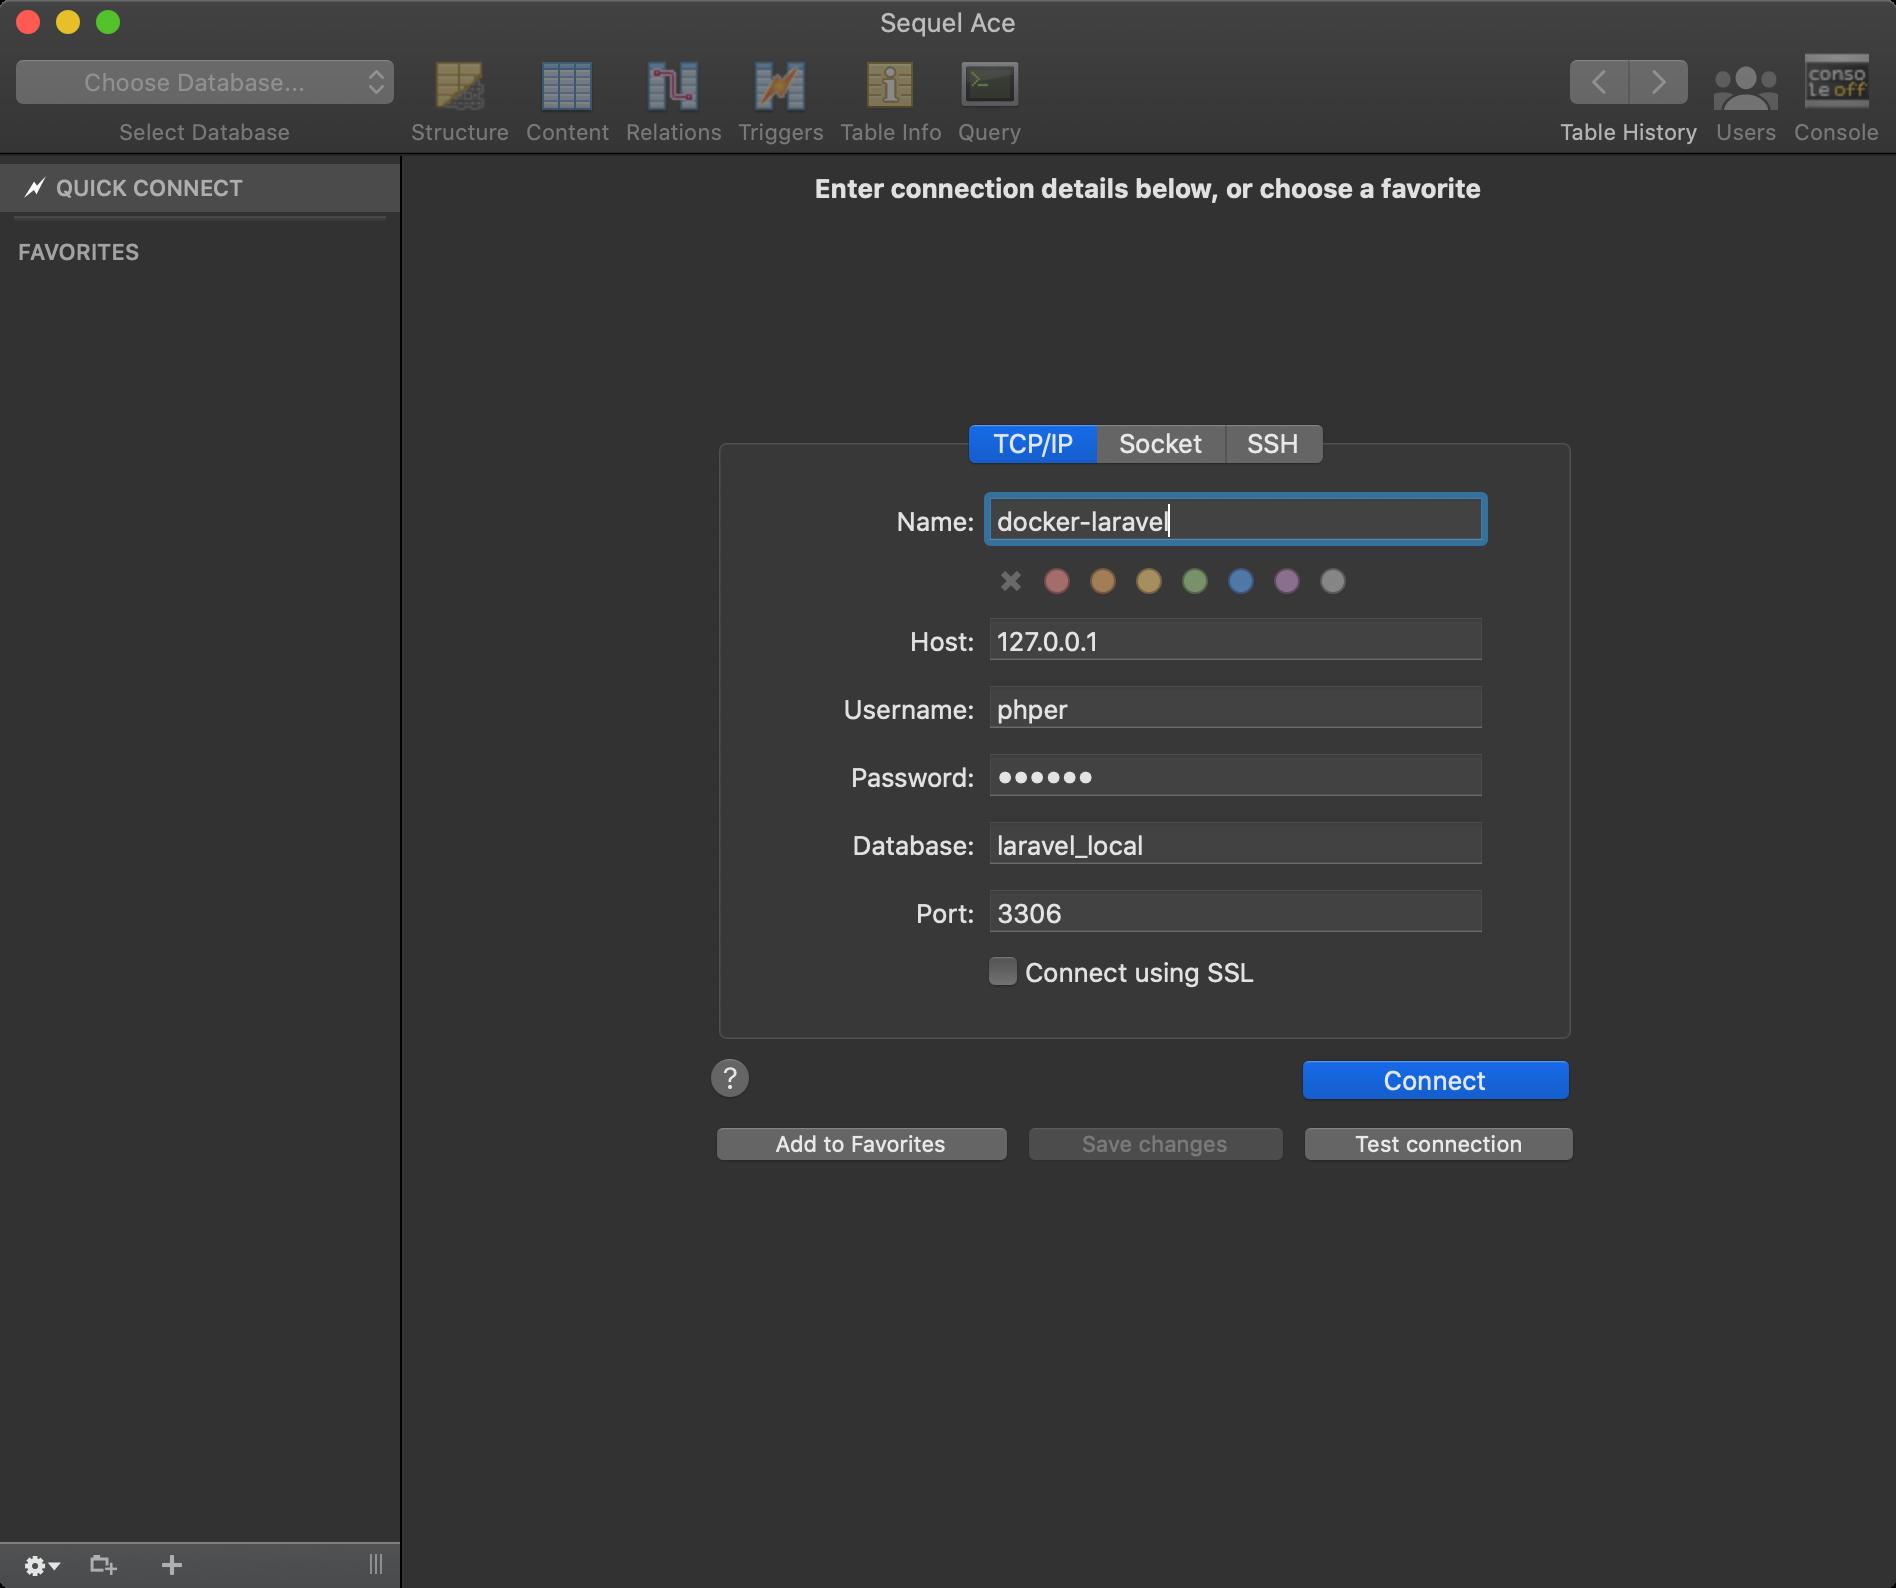 ScreenShot 2020-07-09 11.33.26.png